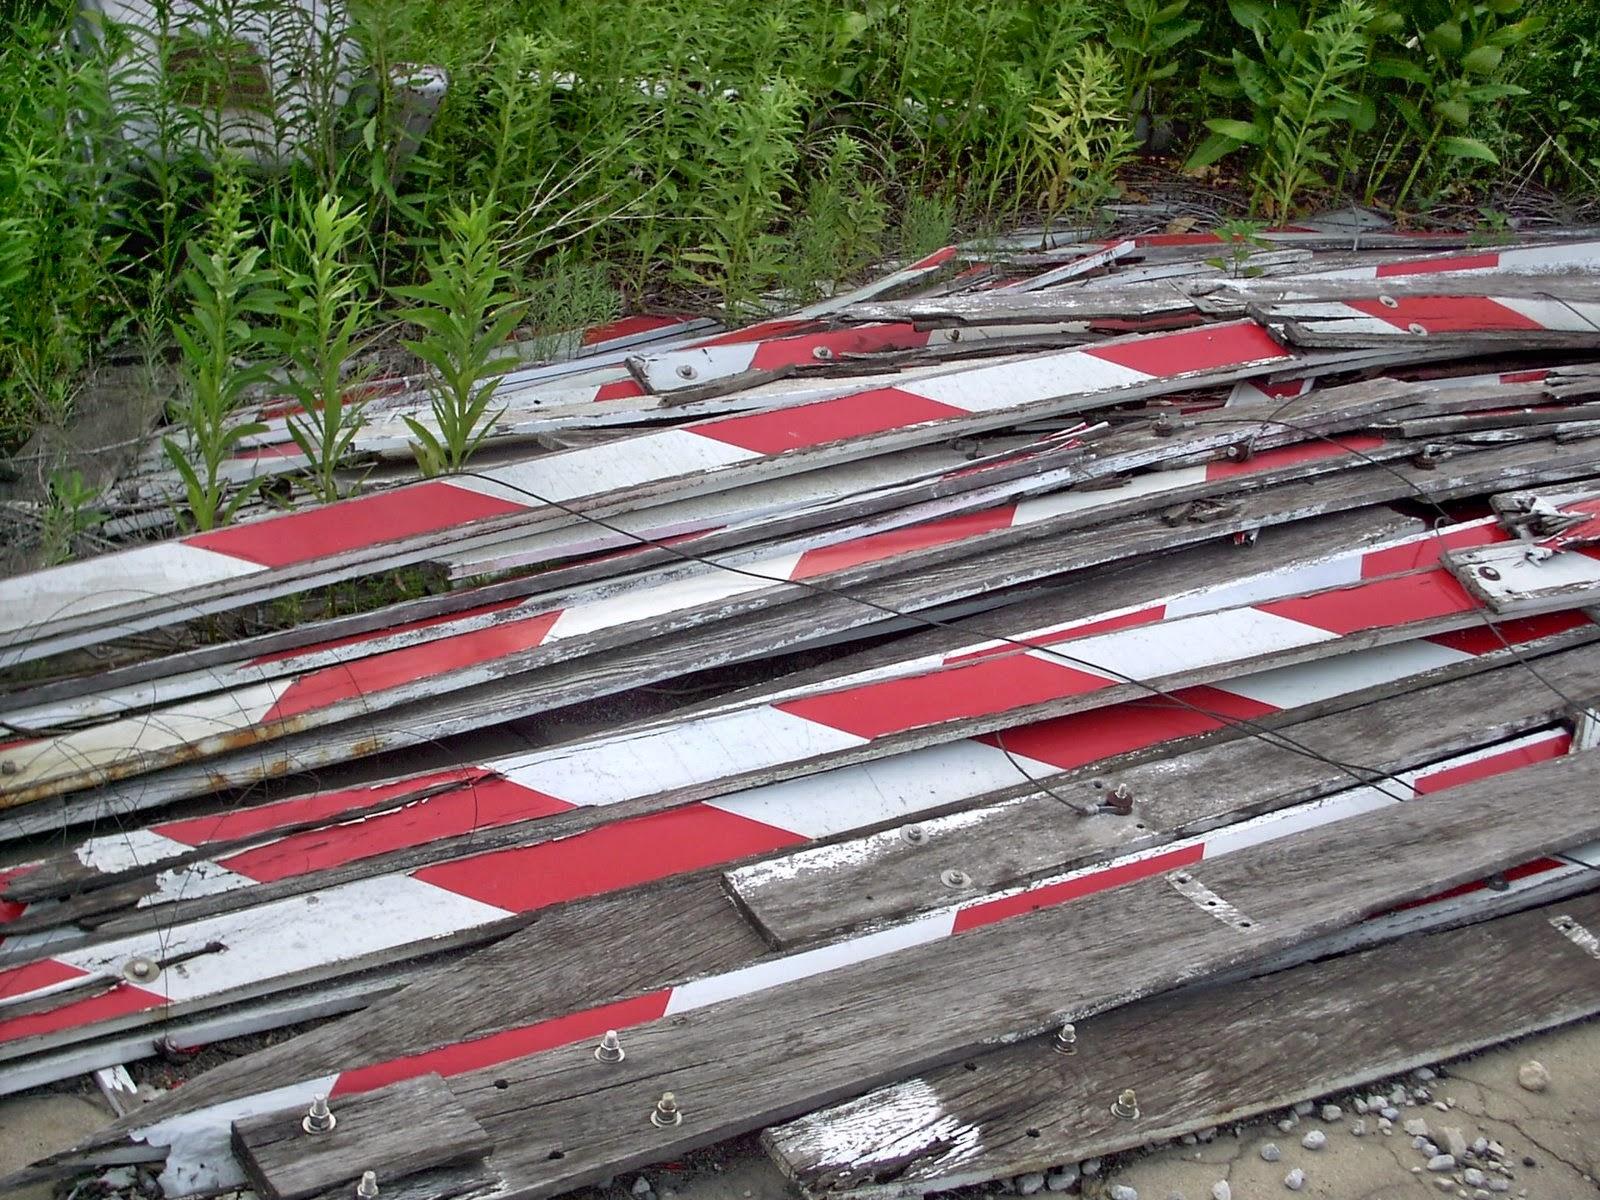 Eddie's Rail Fan Page: Discarded old wooden railroad